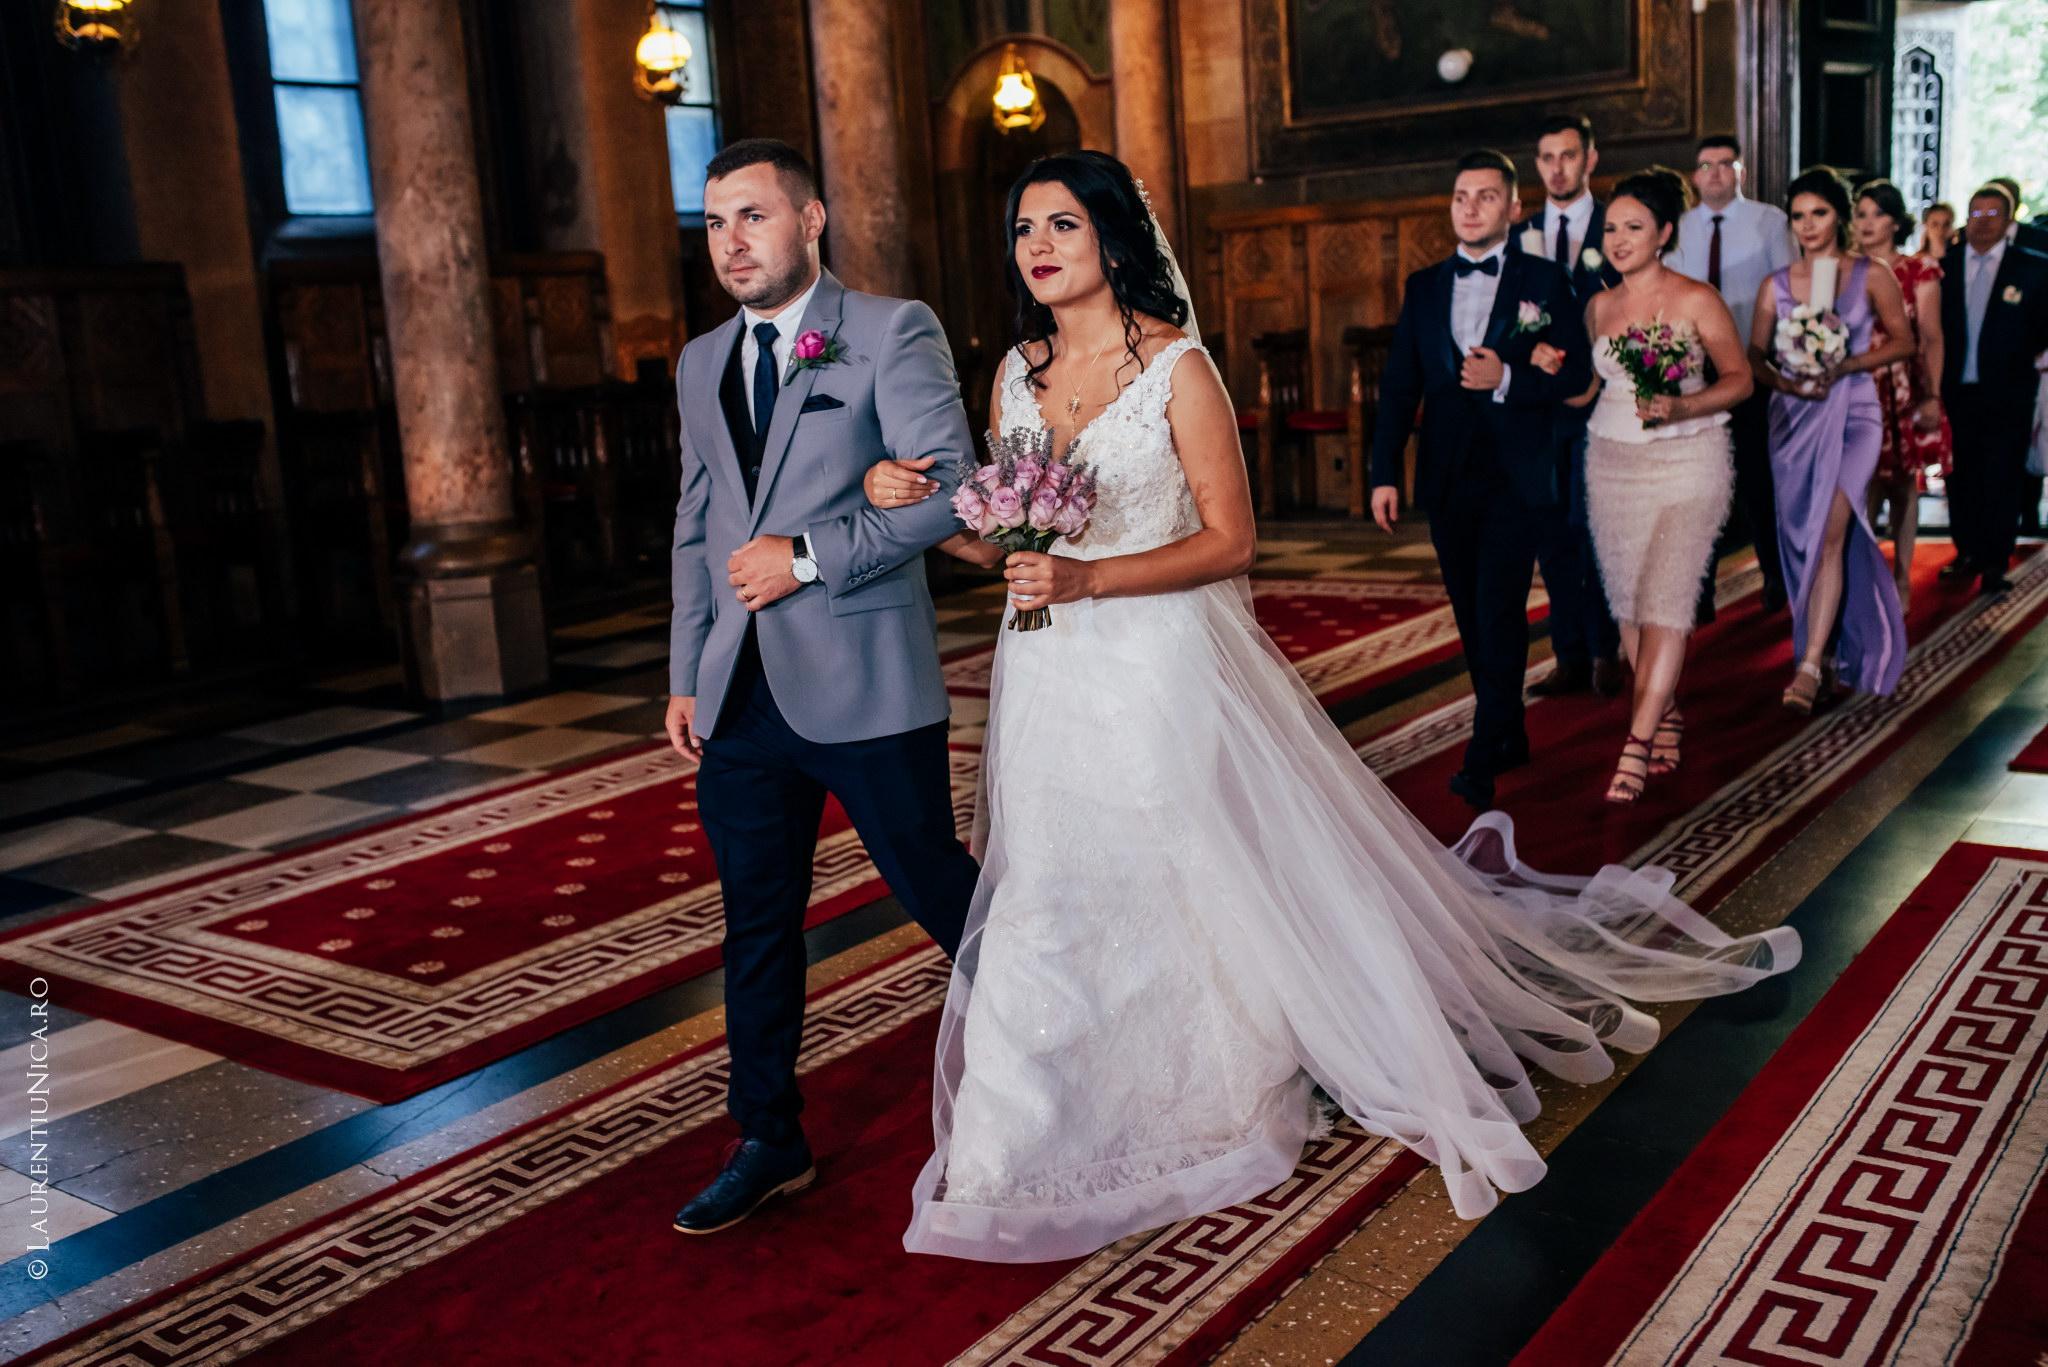 fotografii nunta craiova bia alex fotograf nunta laurentiu nica 34 - Bia & Alex | Fotografii nunta | Craiova